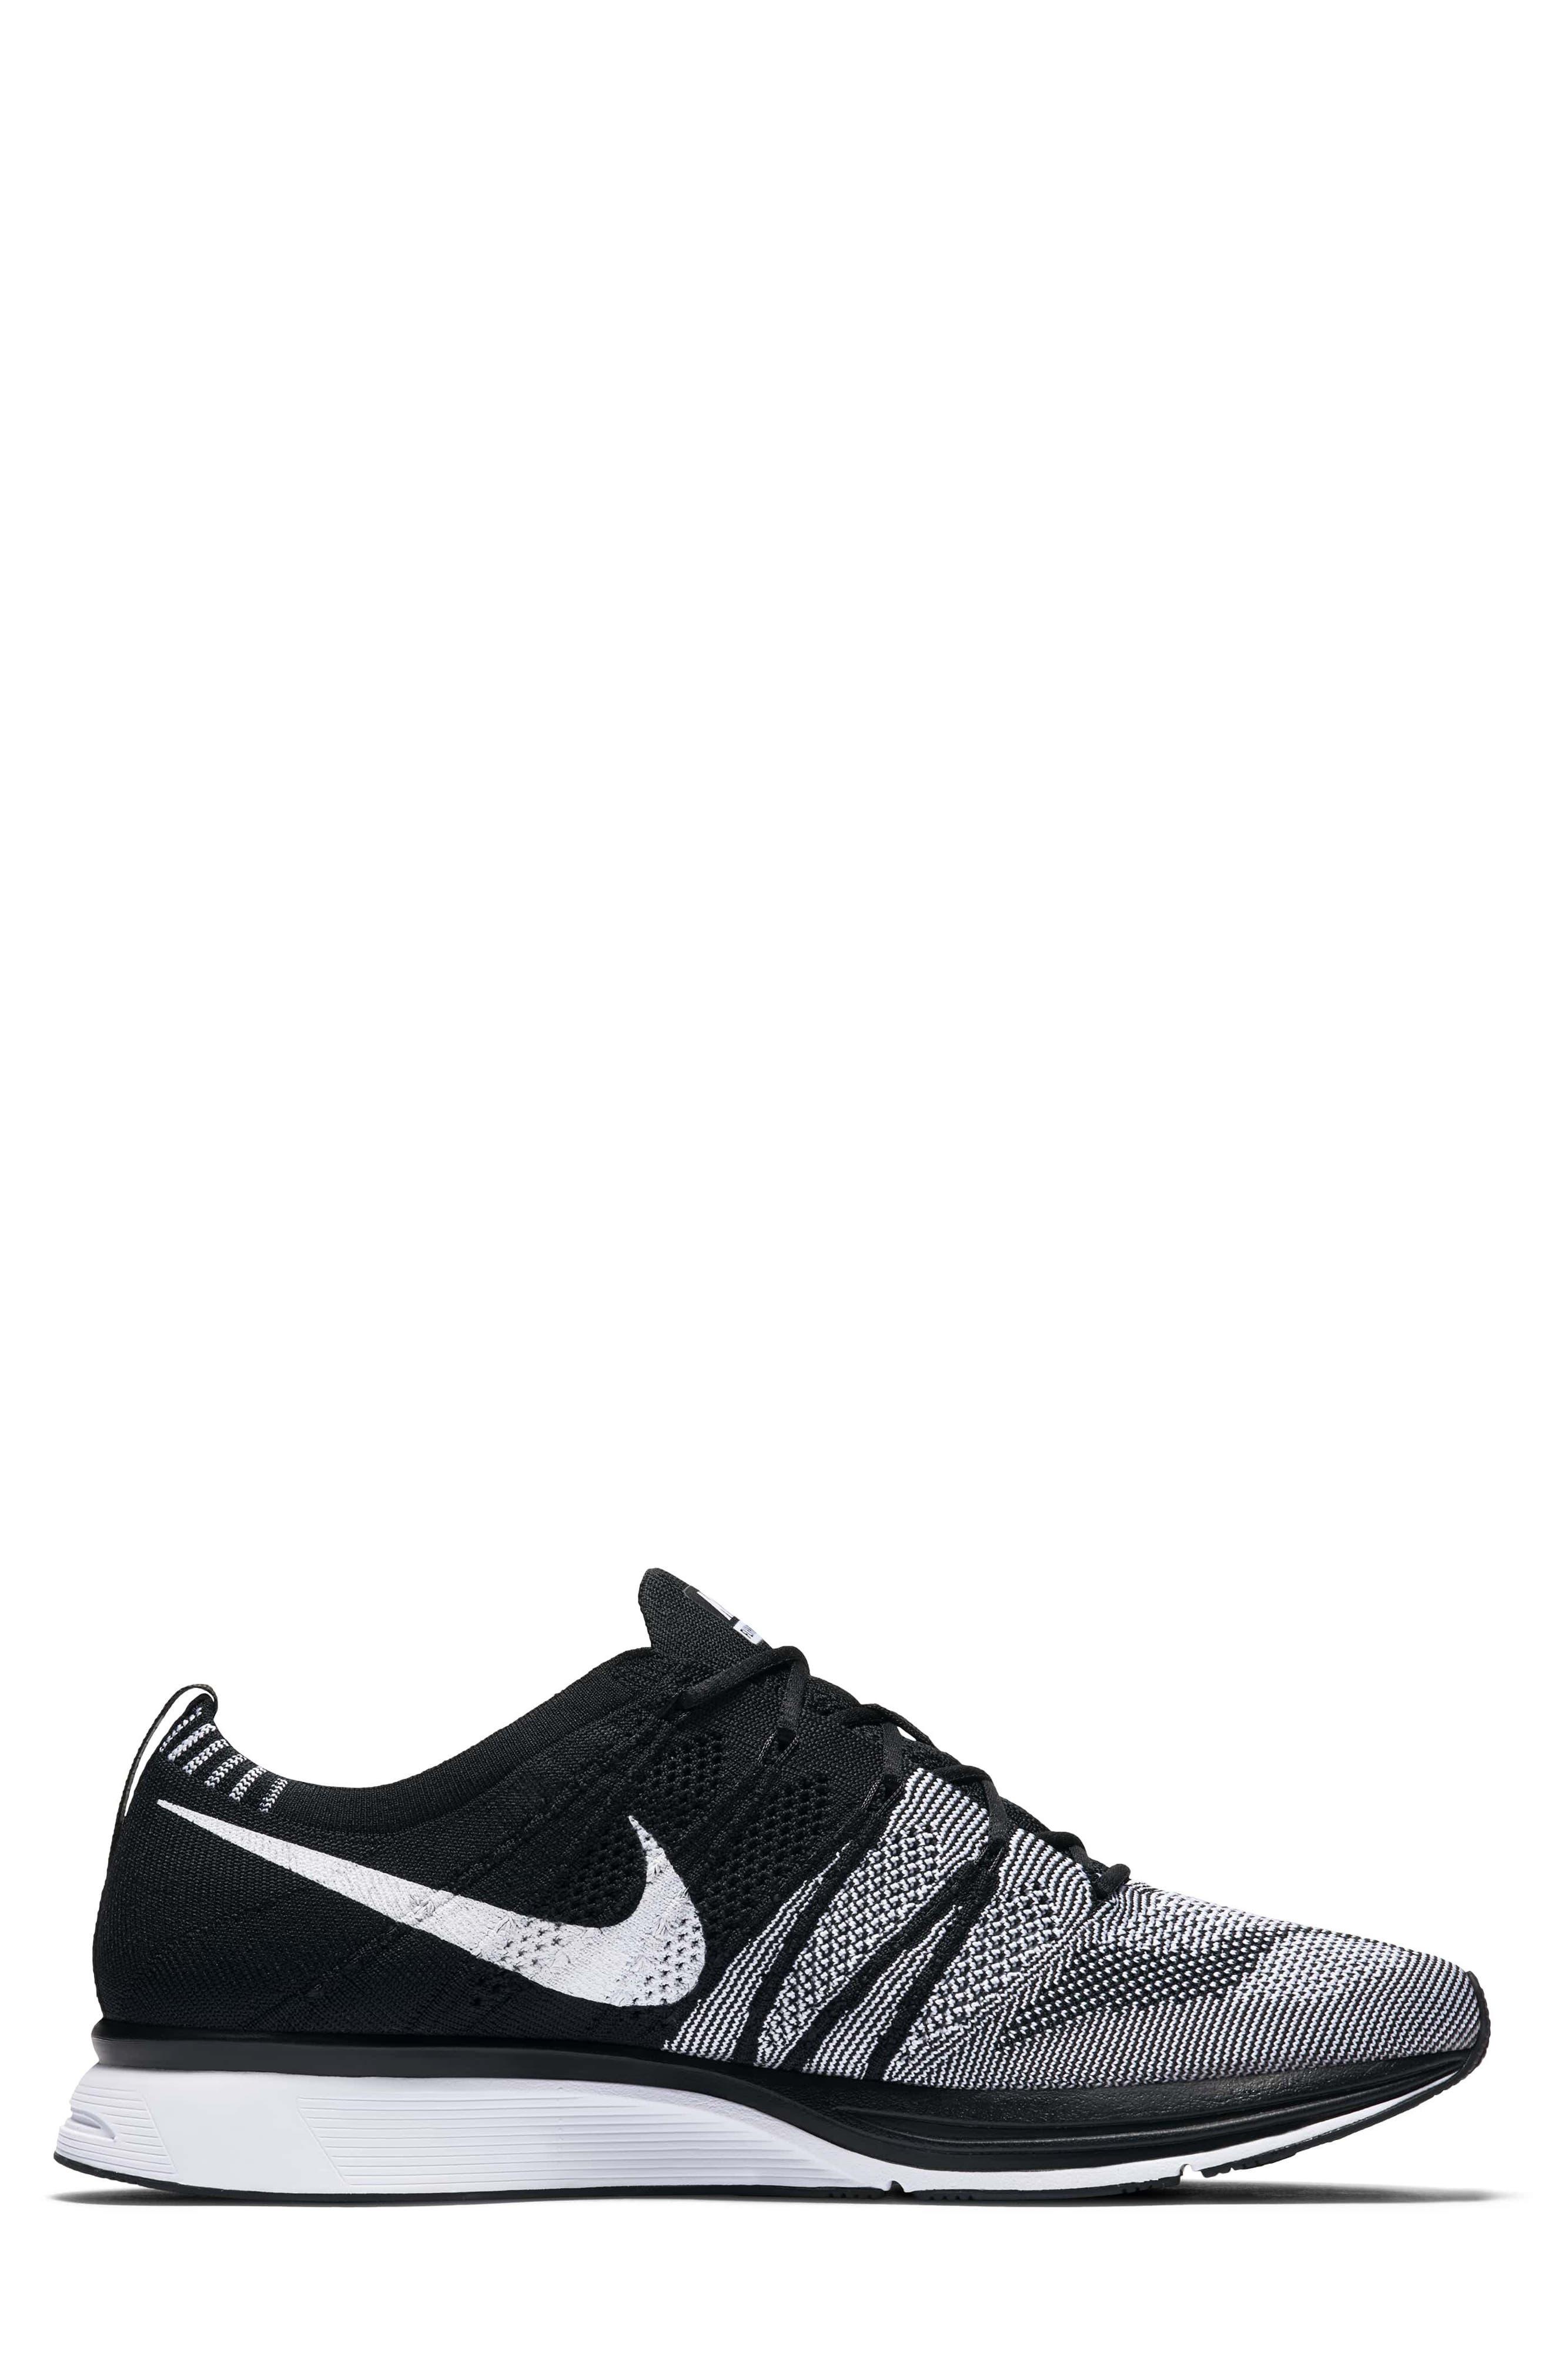 Flyknit Trainer Sneaker,                             Alternate thumbnail 12, color,